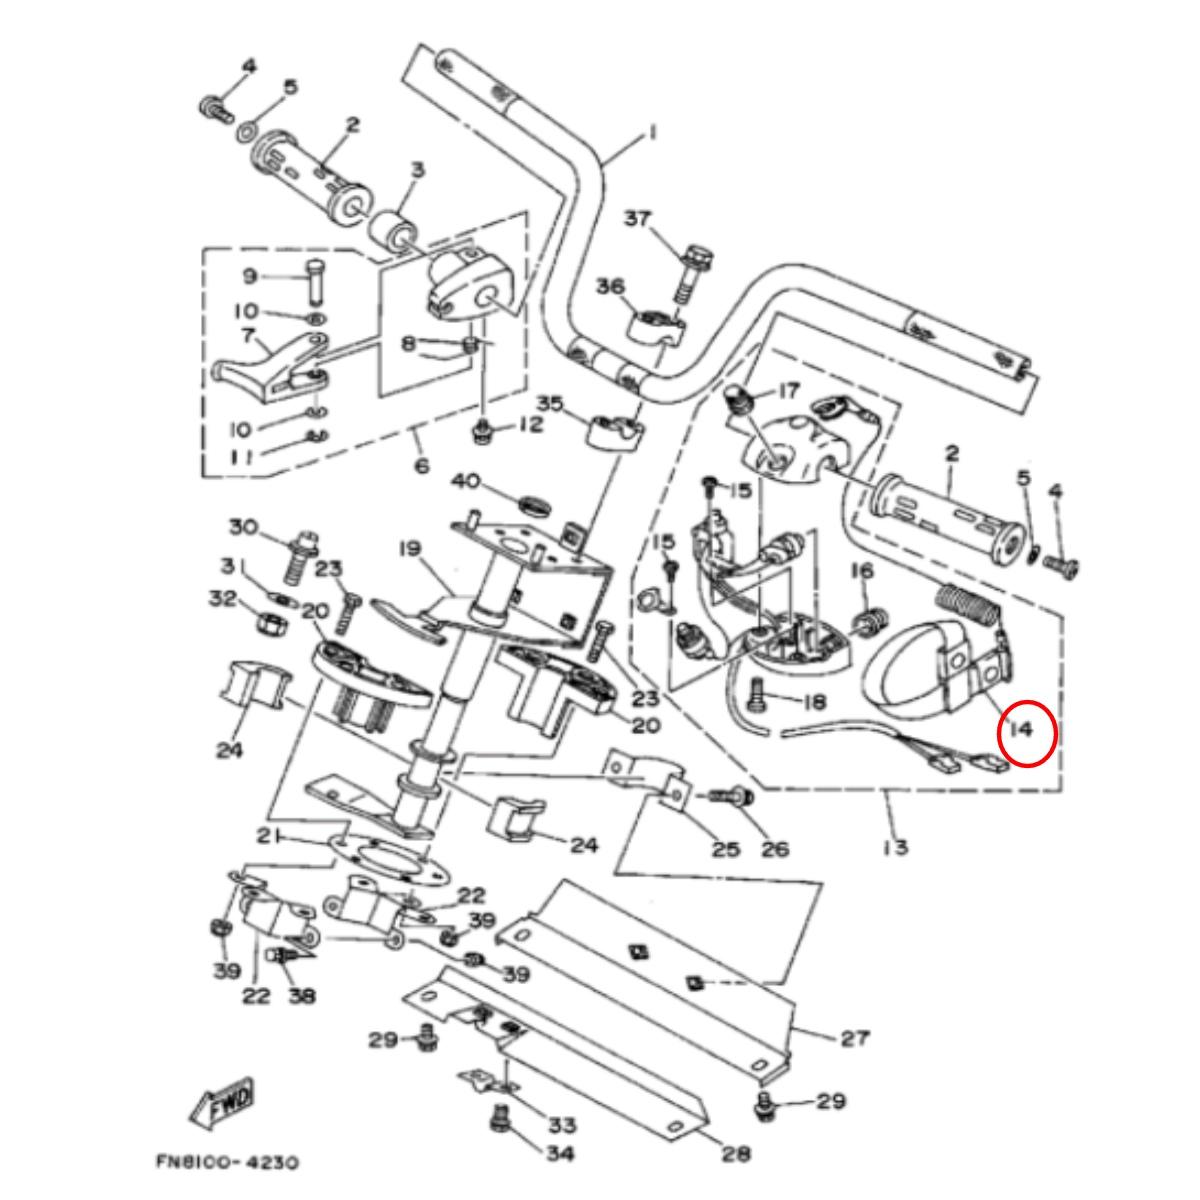 Corta Circuito com Pulseira de Neoprene para Jet Ski Yamaha e Kawasaki Nacional  - Radical Peças - Peças para Jet Ski